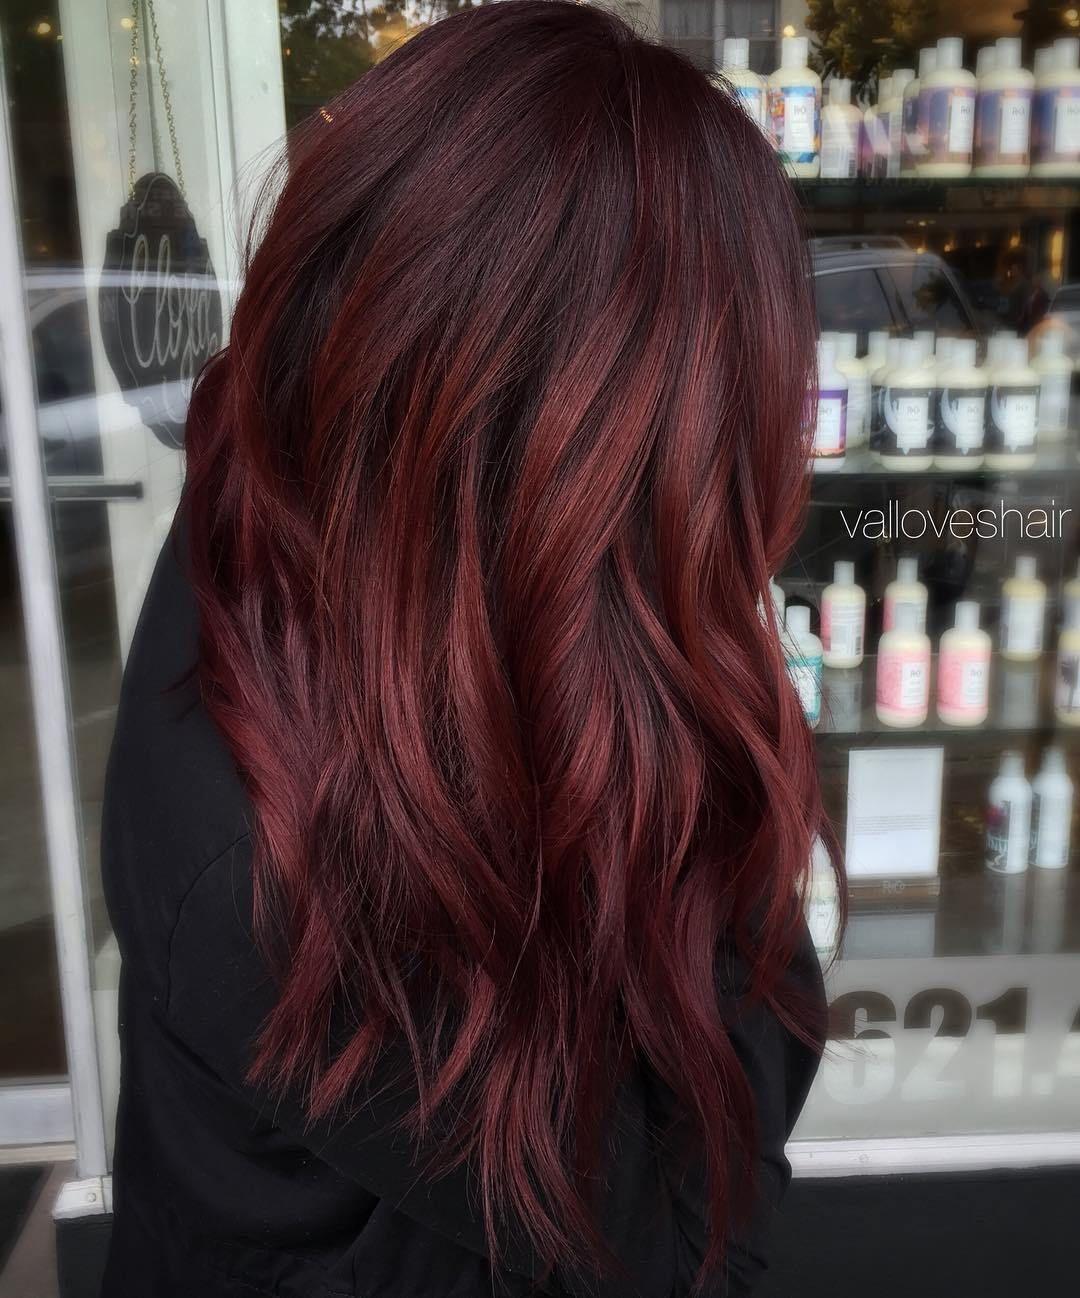 45 Shades Of Burgundy Hair Dark Burgundy Maroon Burgundy With Red Purple And Brown Highlights Dark Burgundy Hair Hair Color Auburn Hair Styles